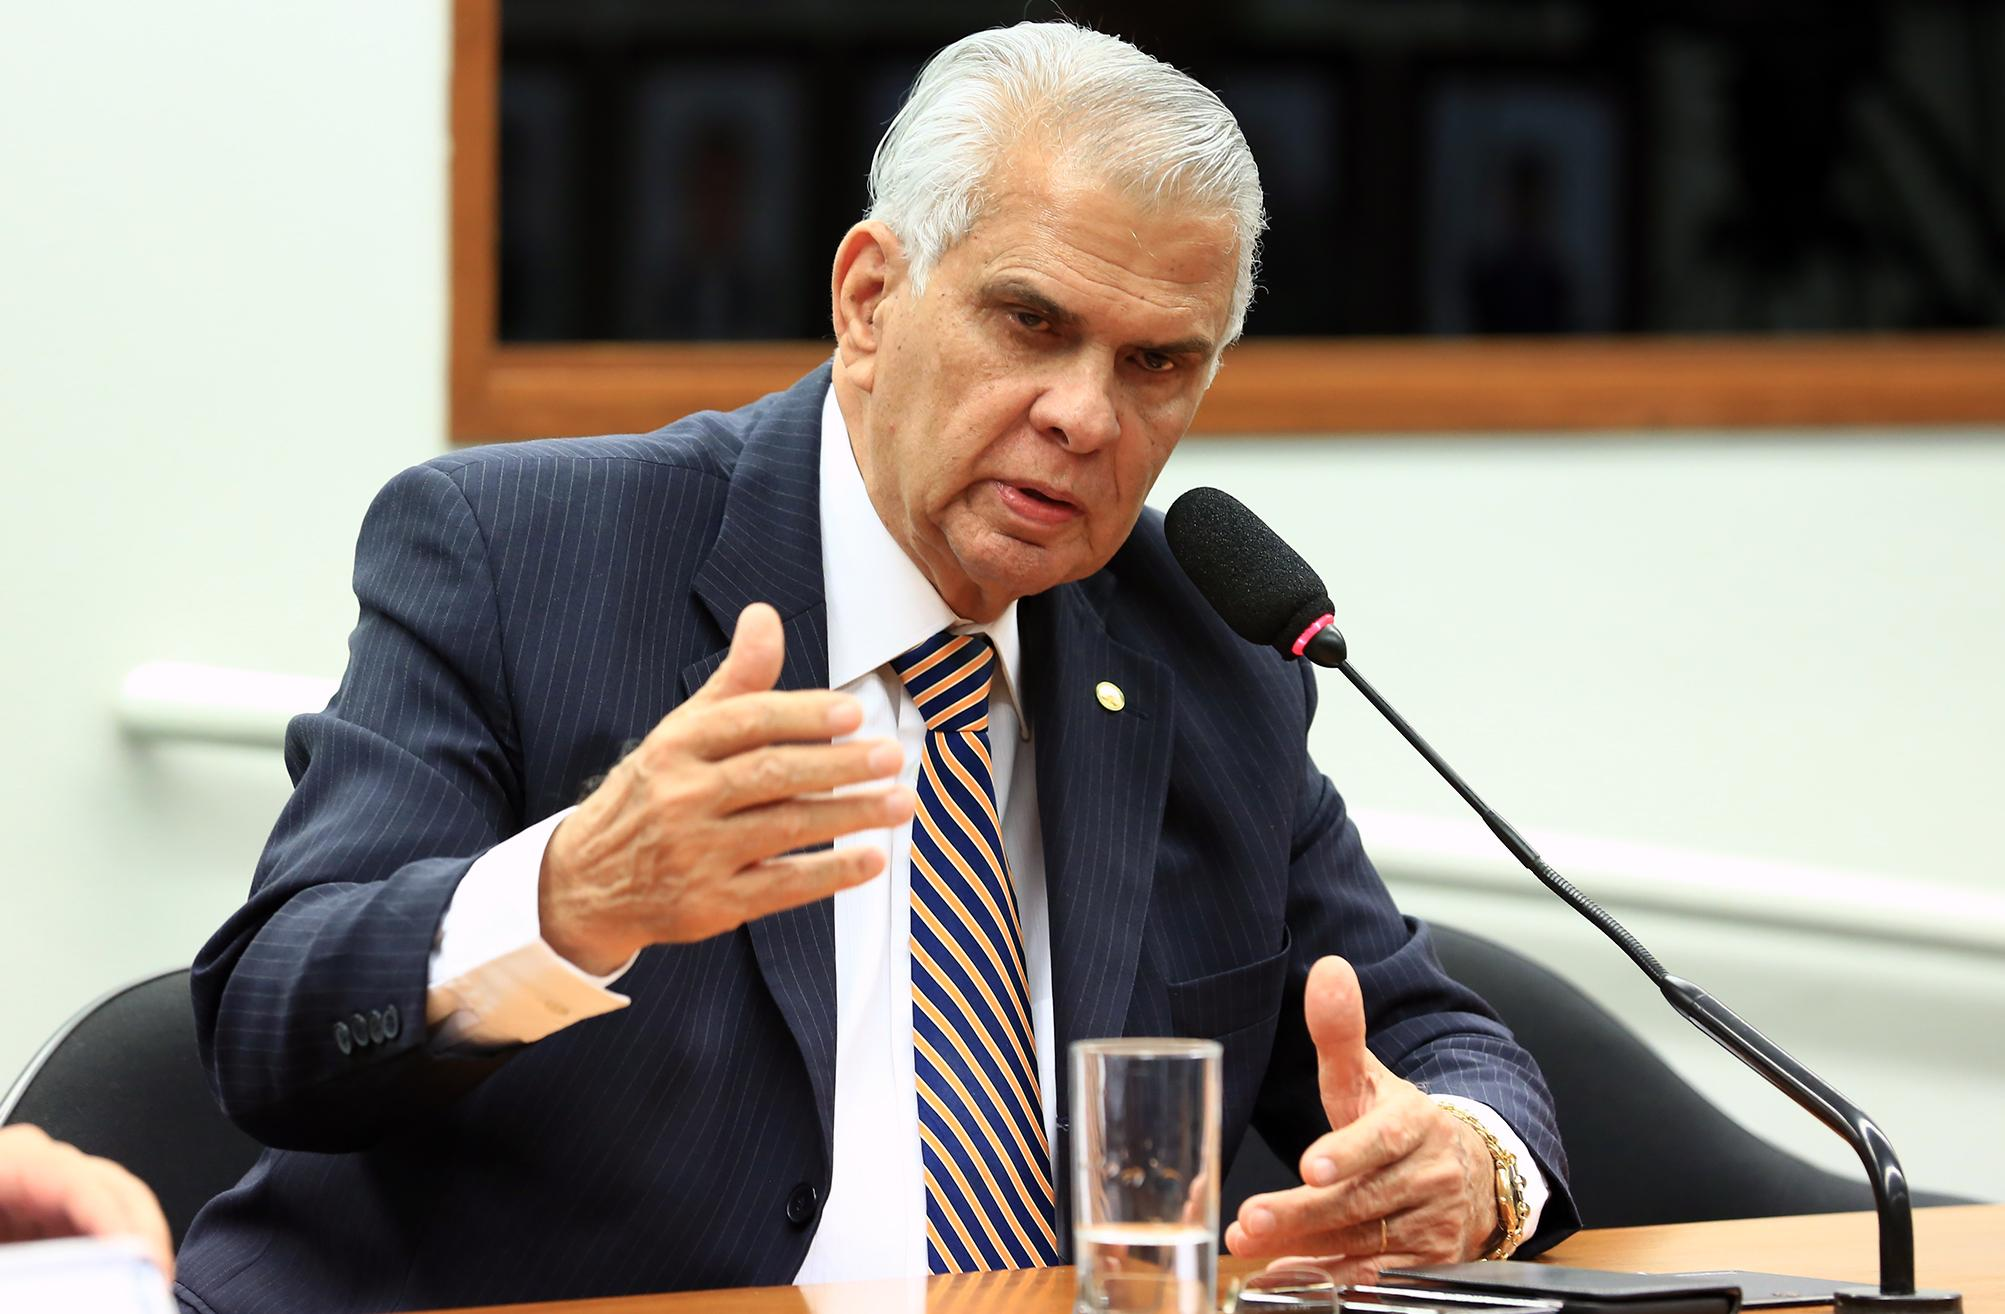 Reunião Ordinária. Dep. José Carlos Araújo (PR - BA)